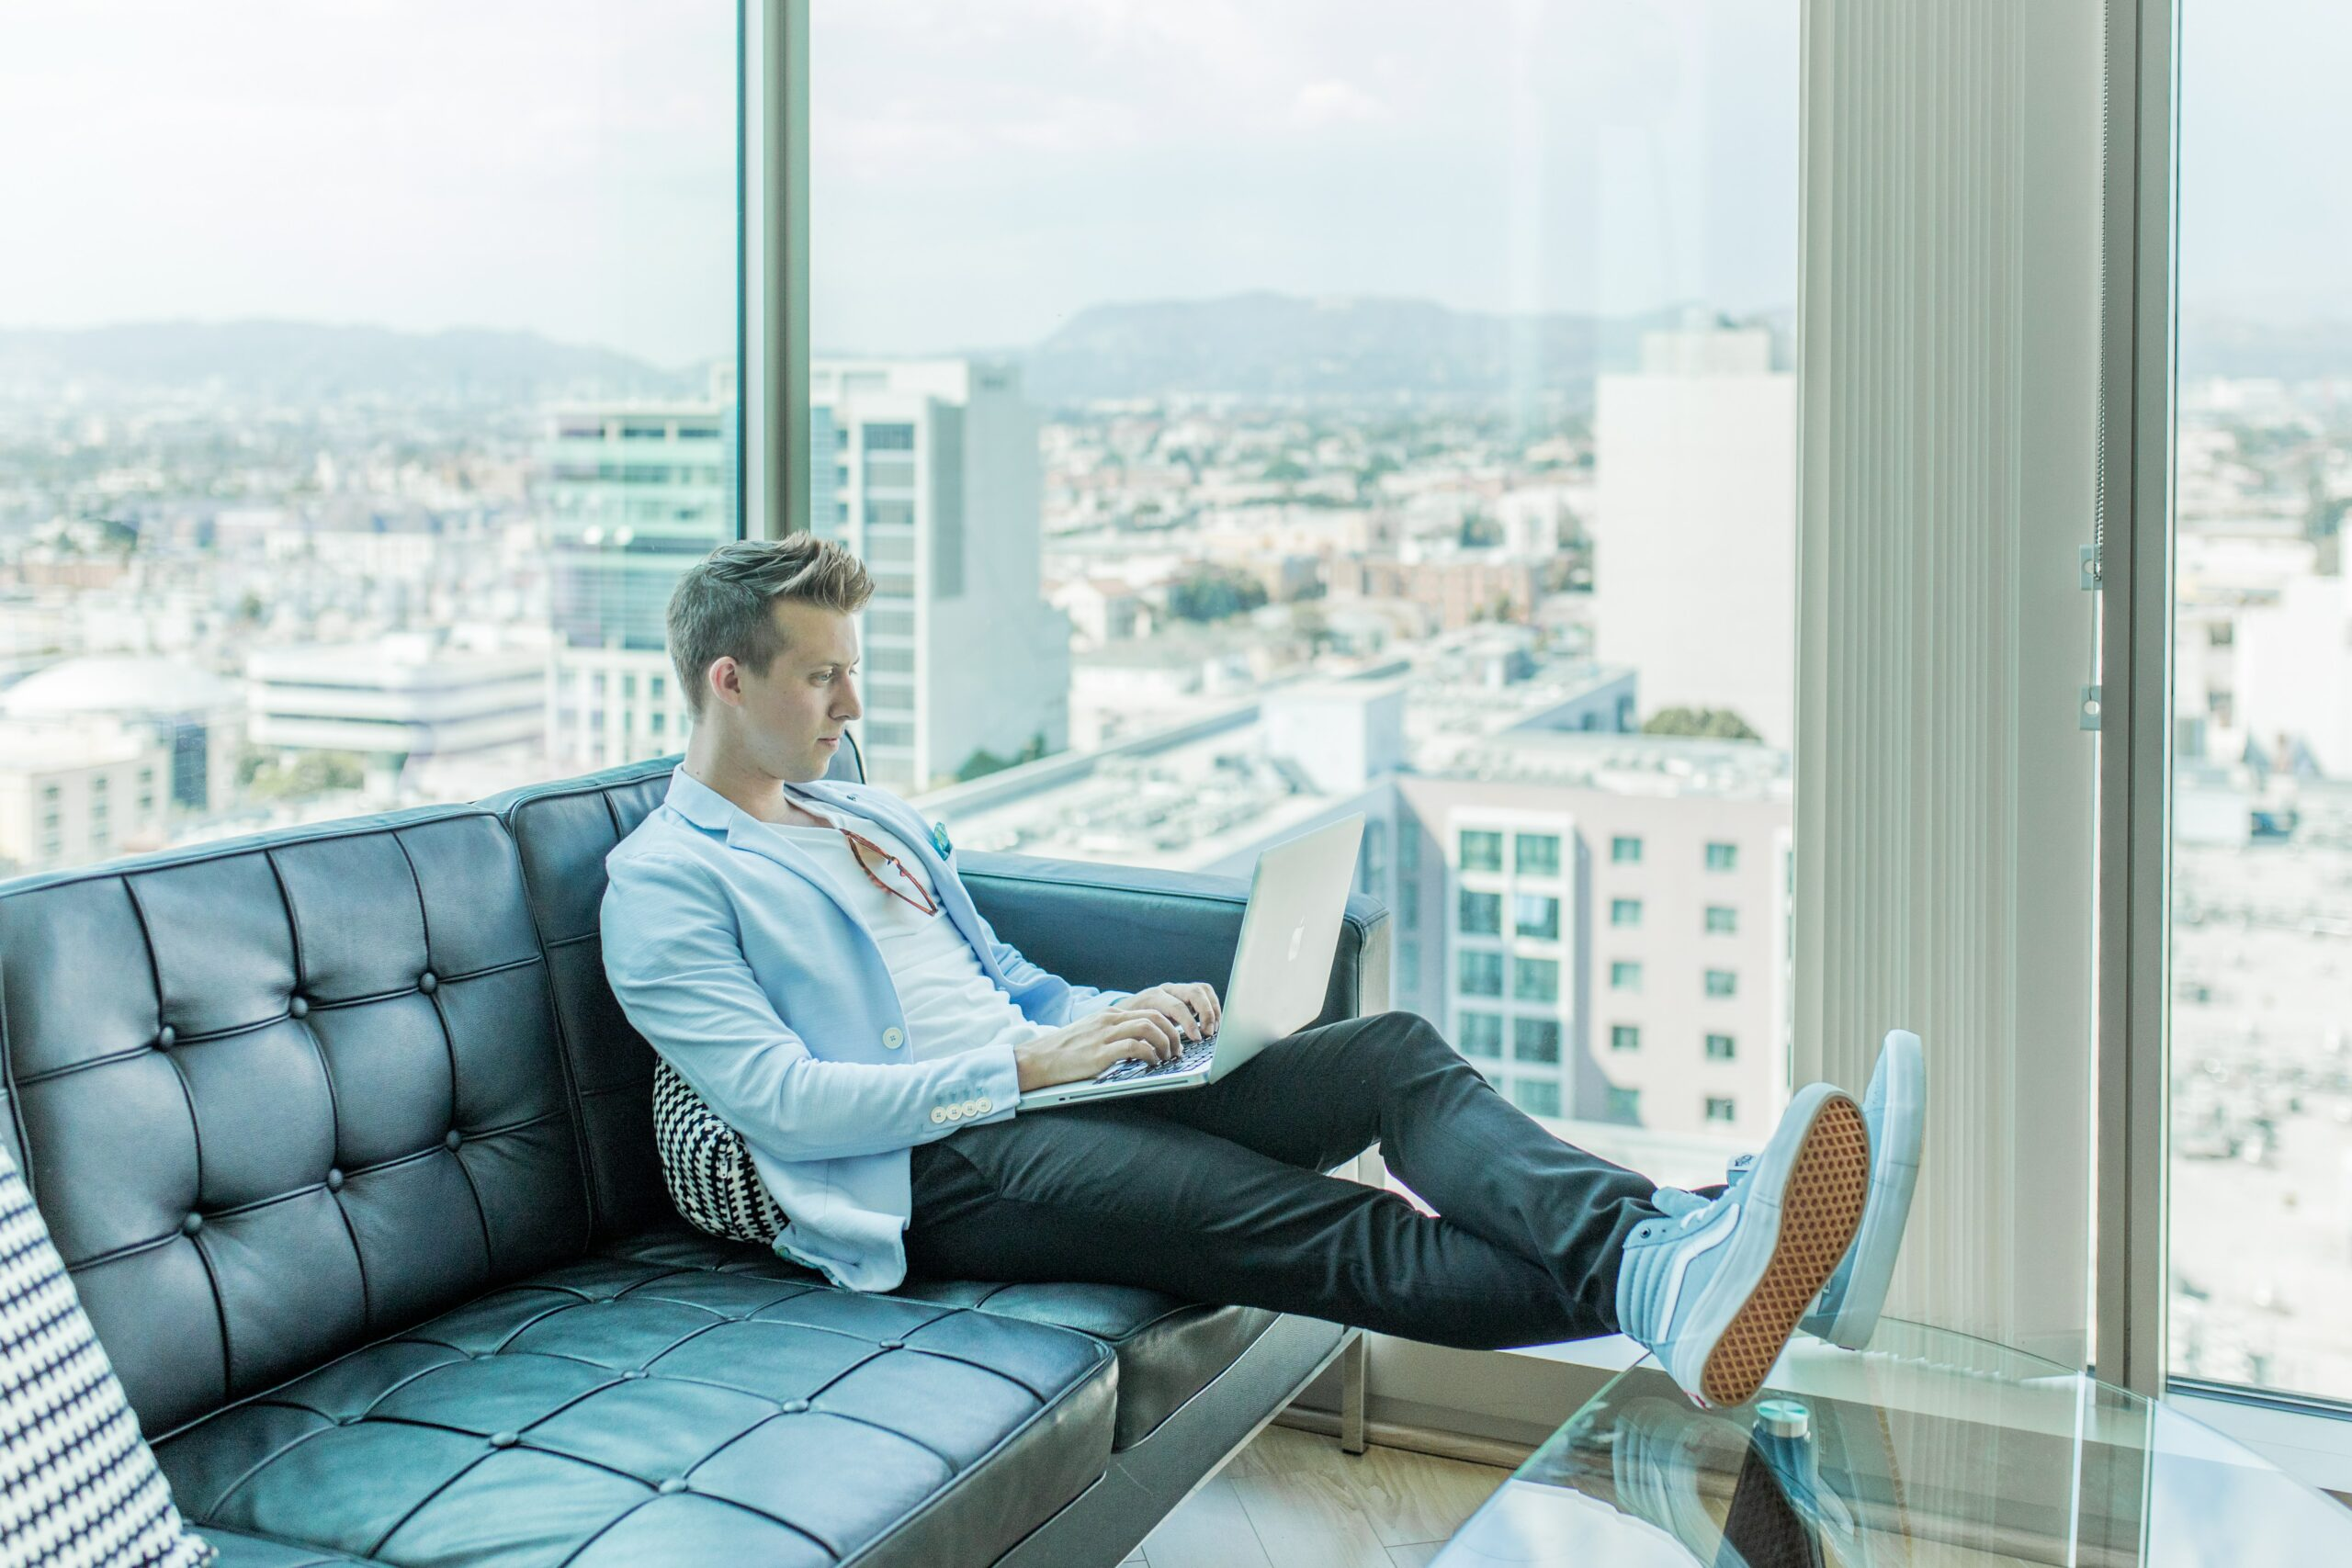 Create profitable online courses